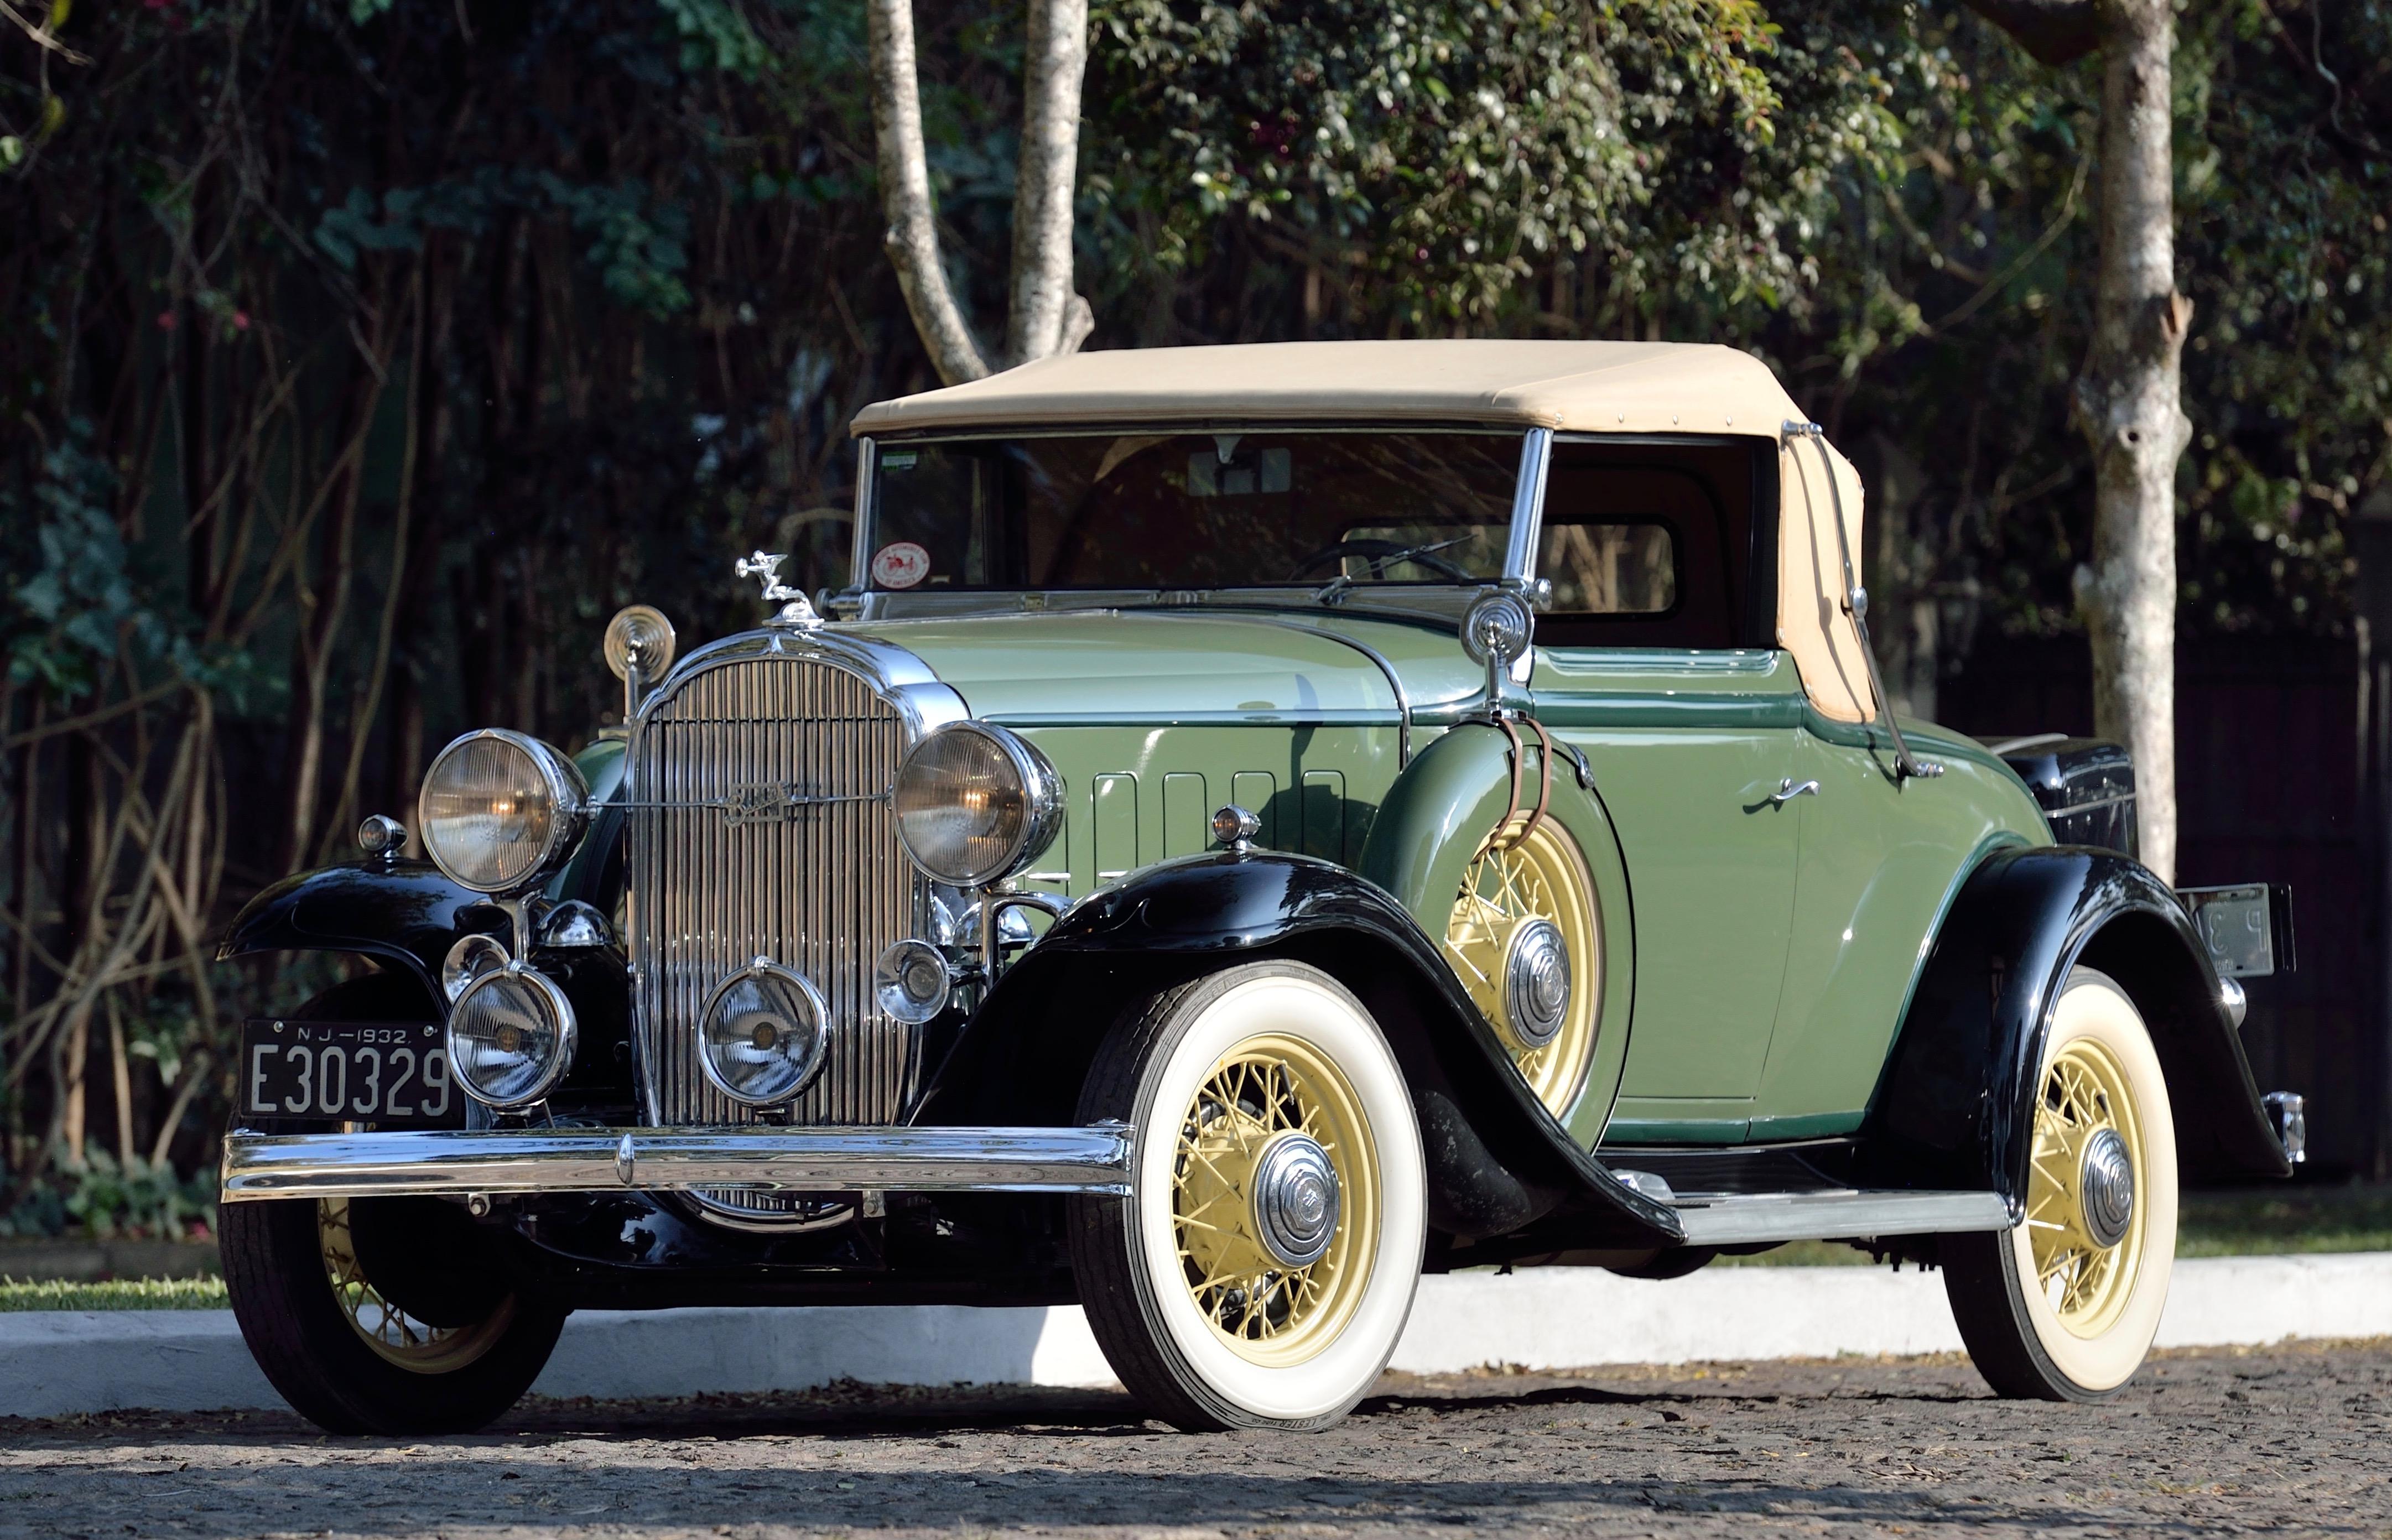 Mecum Auctions, Sueiras collection headlines Mecum's Houston docket, ClassicCars.com Journal